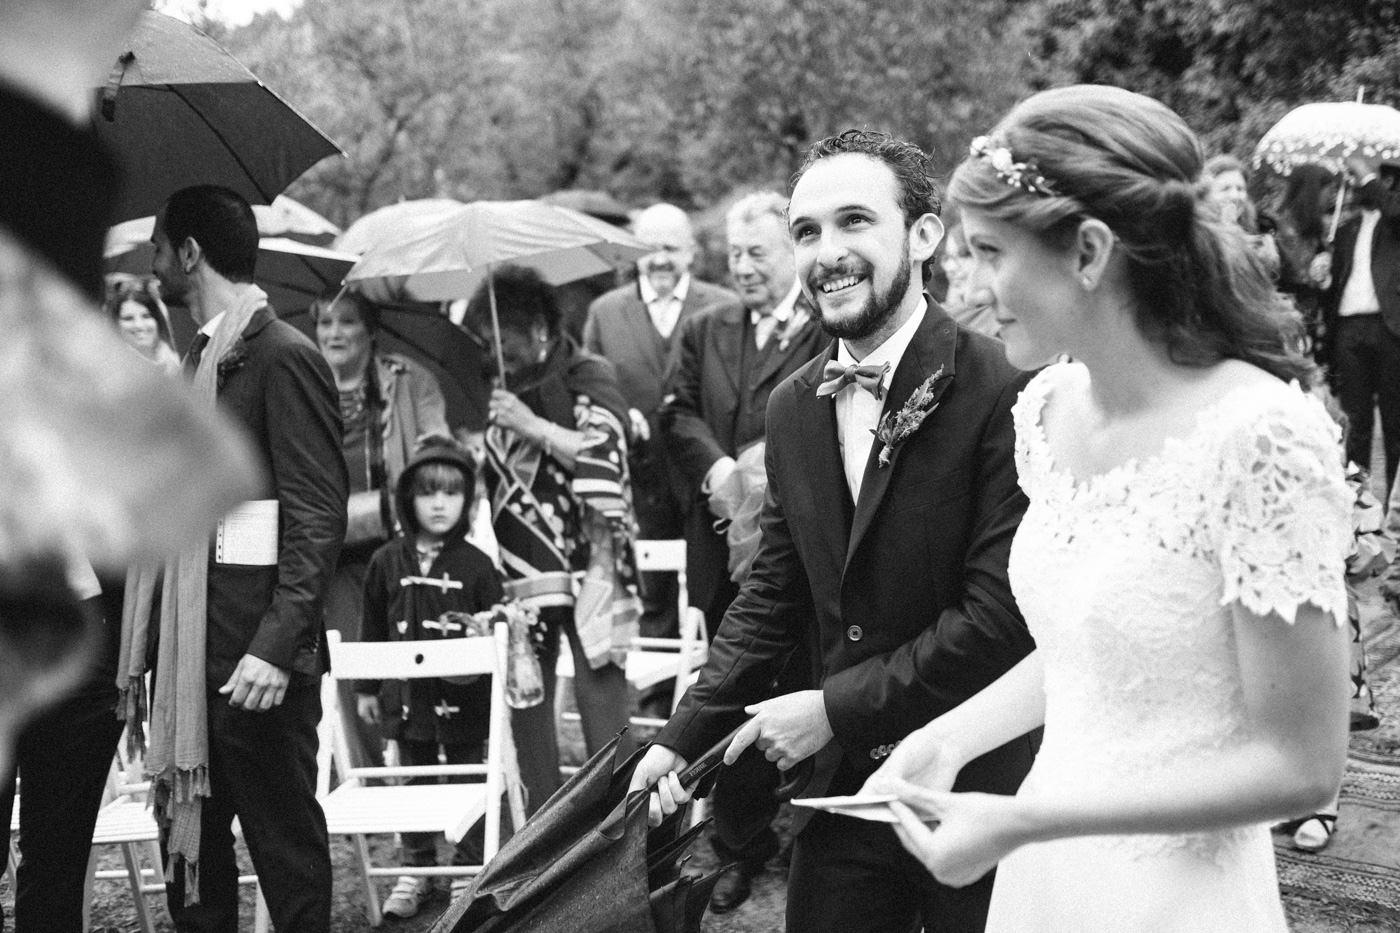 matrimoni_all_italiana_fotografo_matrimonio_toscana-40.jpg